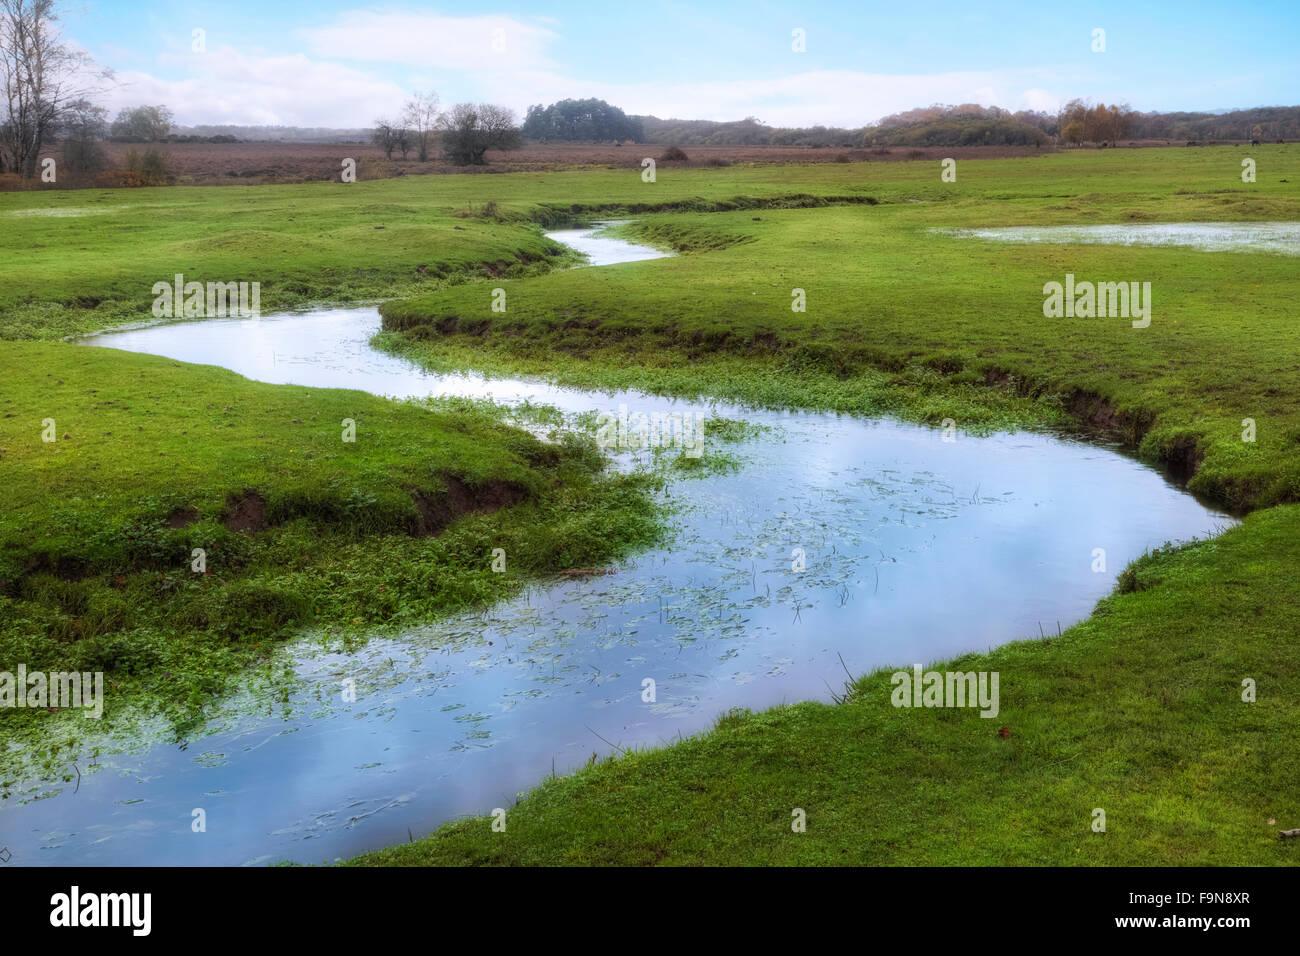 Longwater Lawn, New Forest, Lyndhurst, Hampshire, England, UK - Stock Image